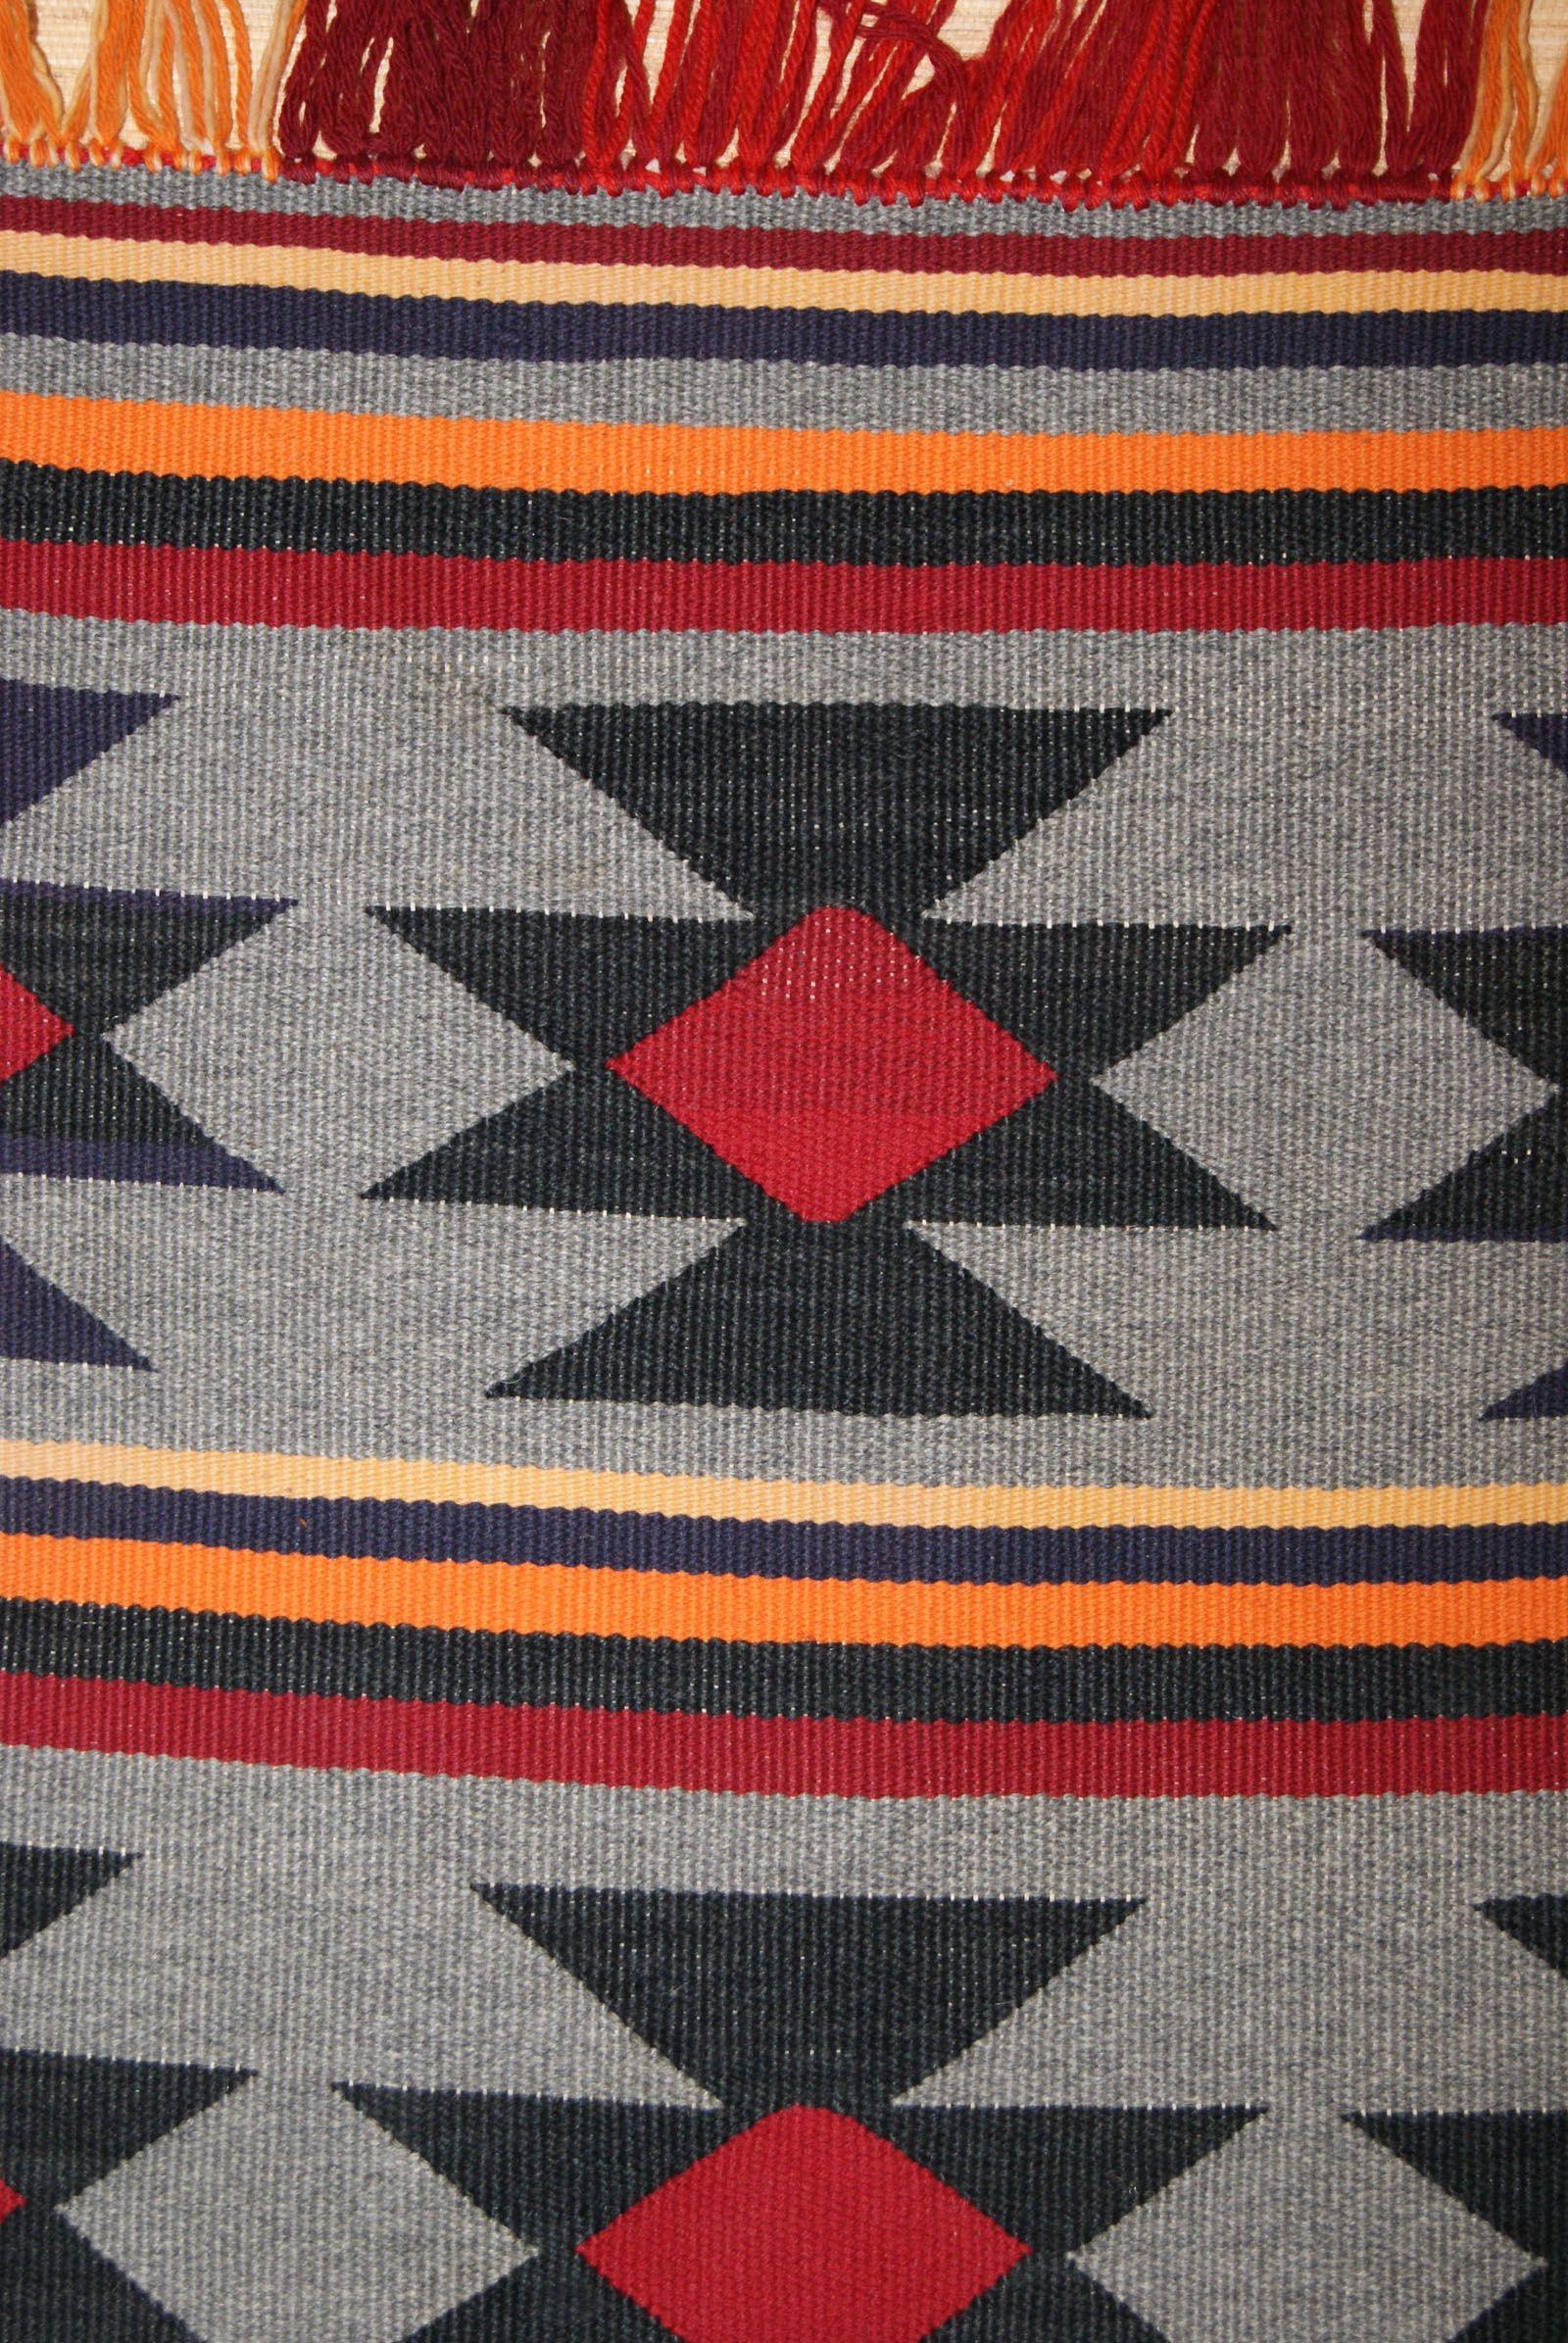 Germantown navajo weaving click for larger view use your back germantown navajo weaving click for larger view use your back biocorpaavc Images